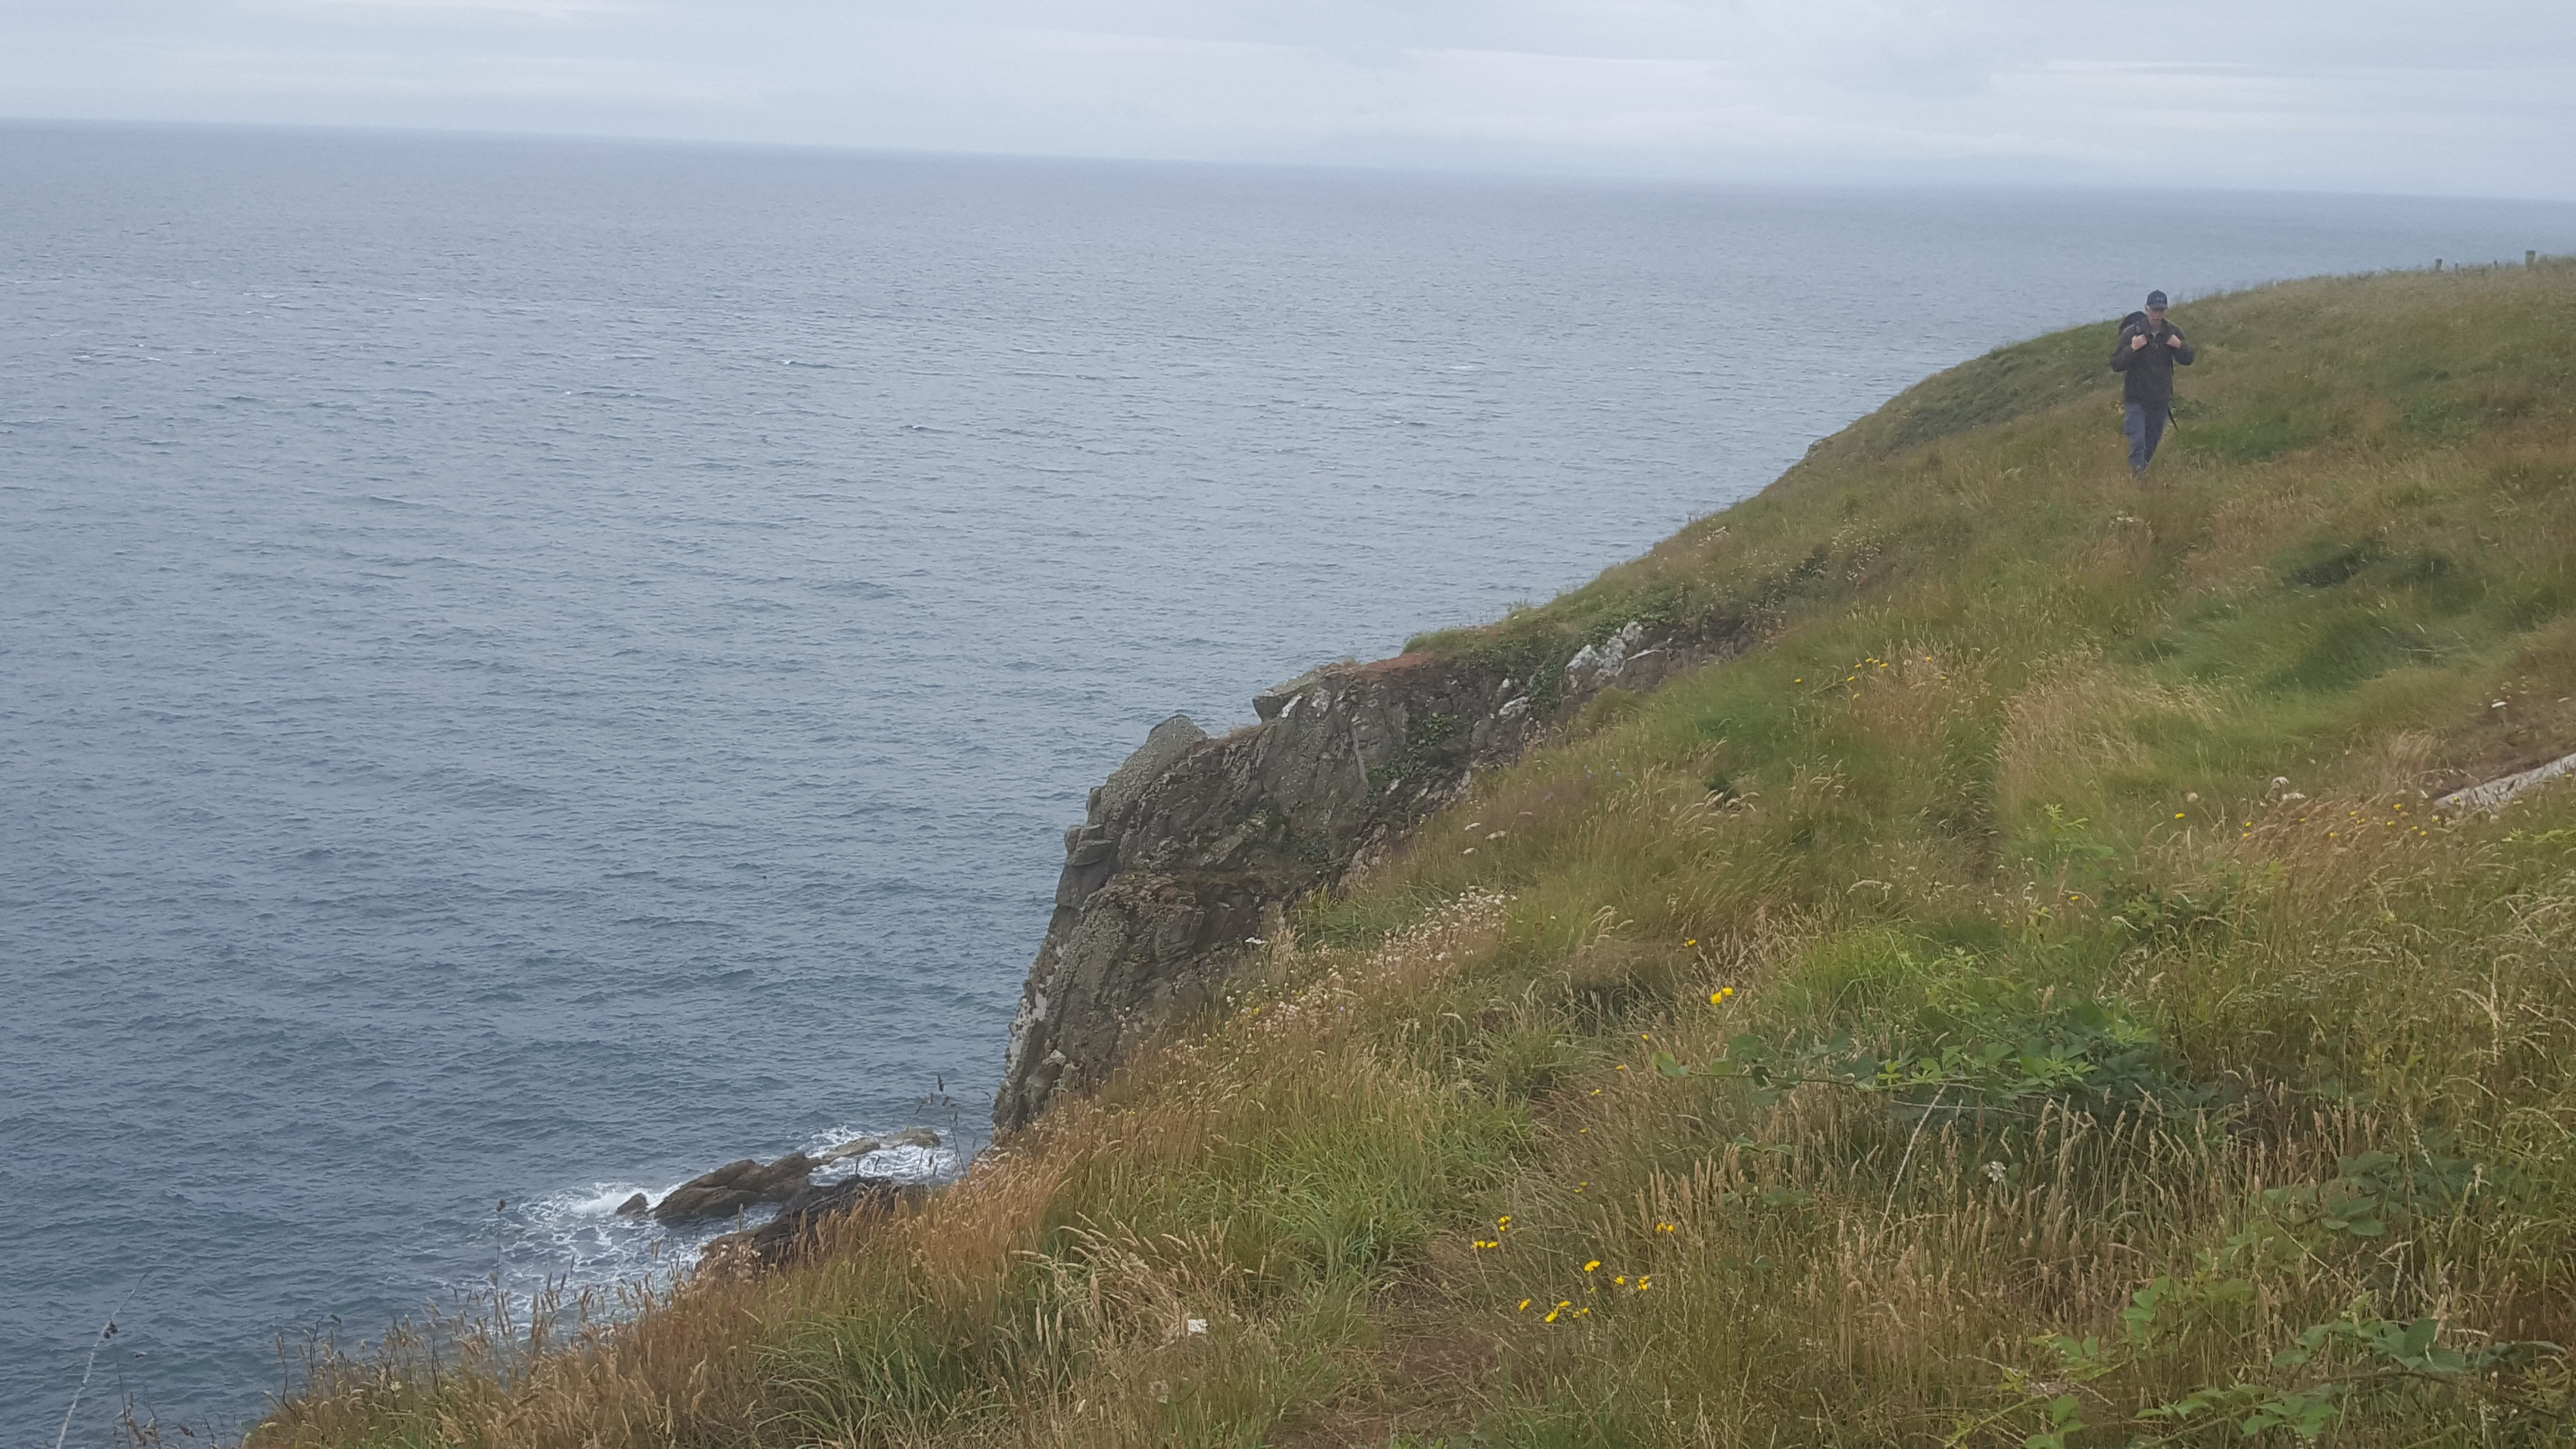 Chris on cliffs